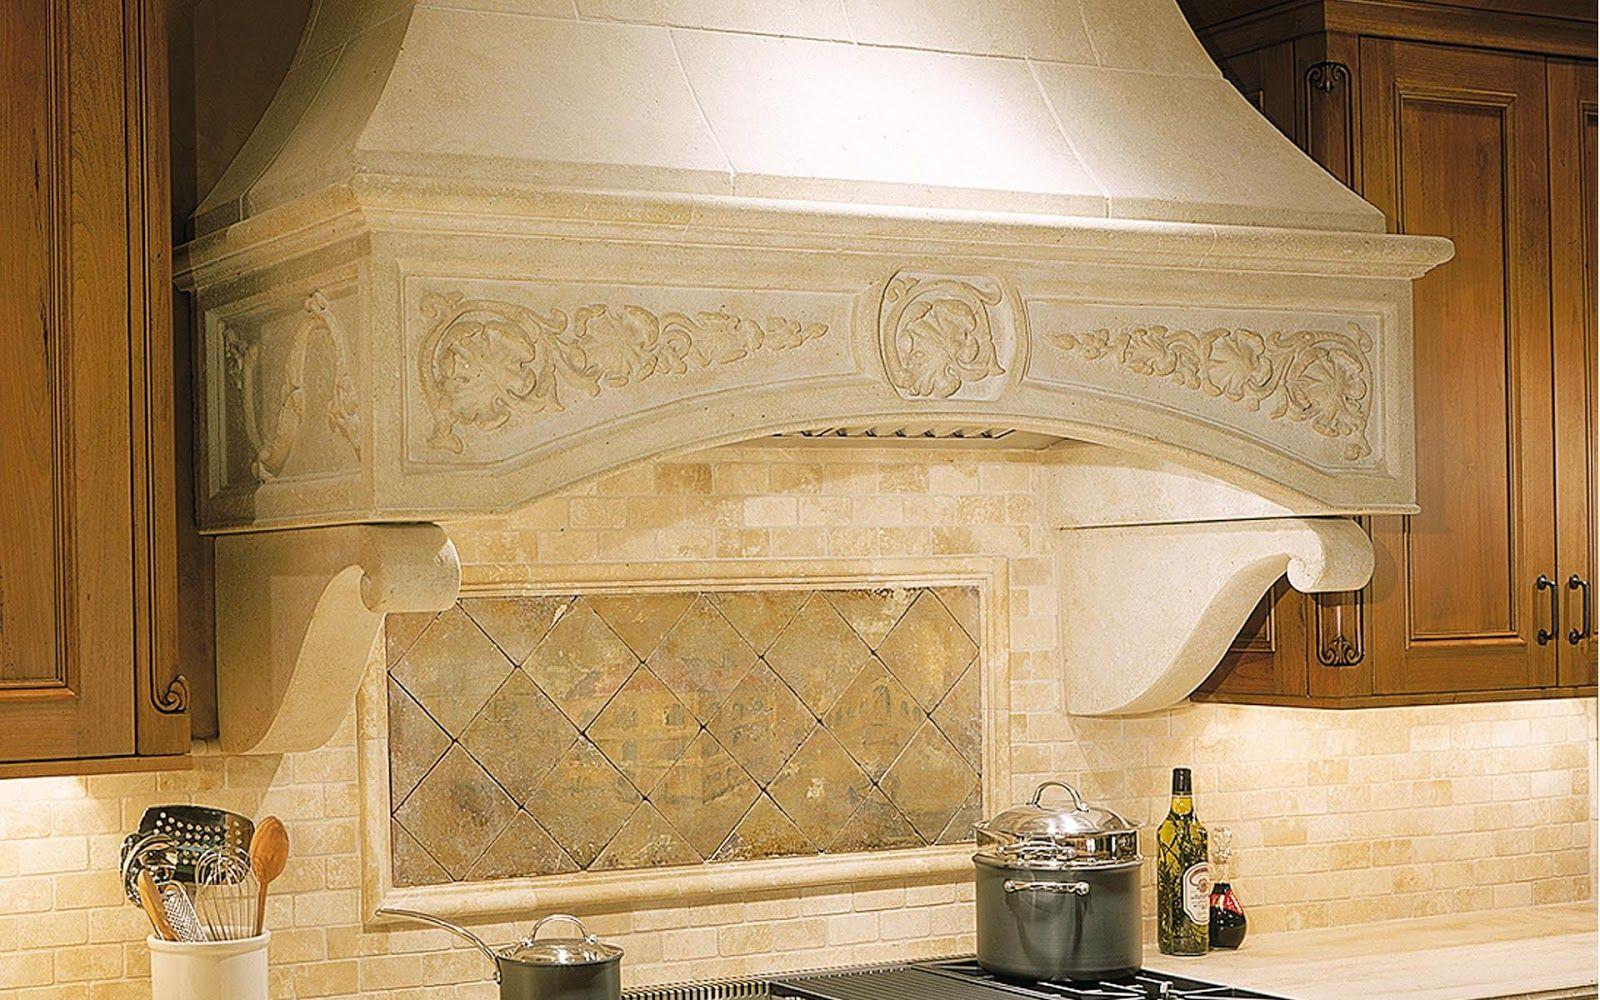 Best Kitchen Gallery: Kcfauxdesign Diy Decorative Hood Range Vent Kitchen Ideas of Decorative Kitchen Hoods For Stoves on rachelxblog.com